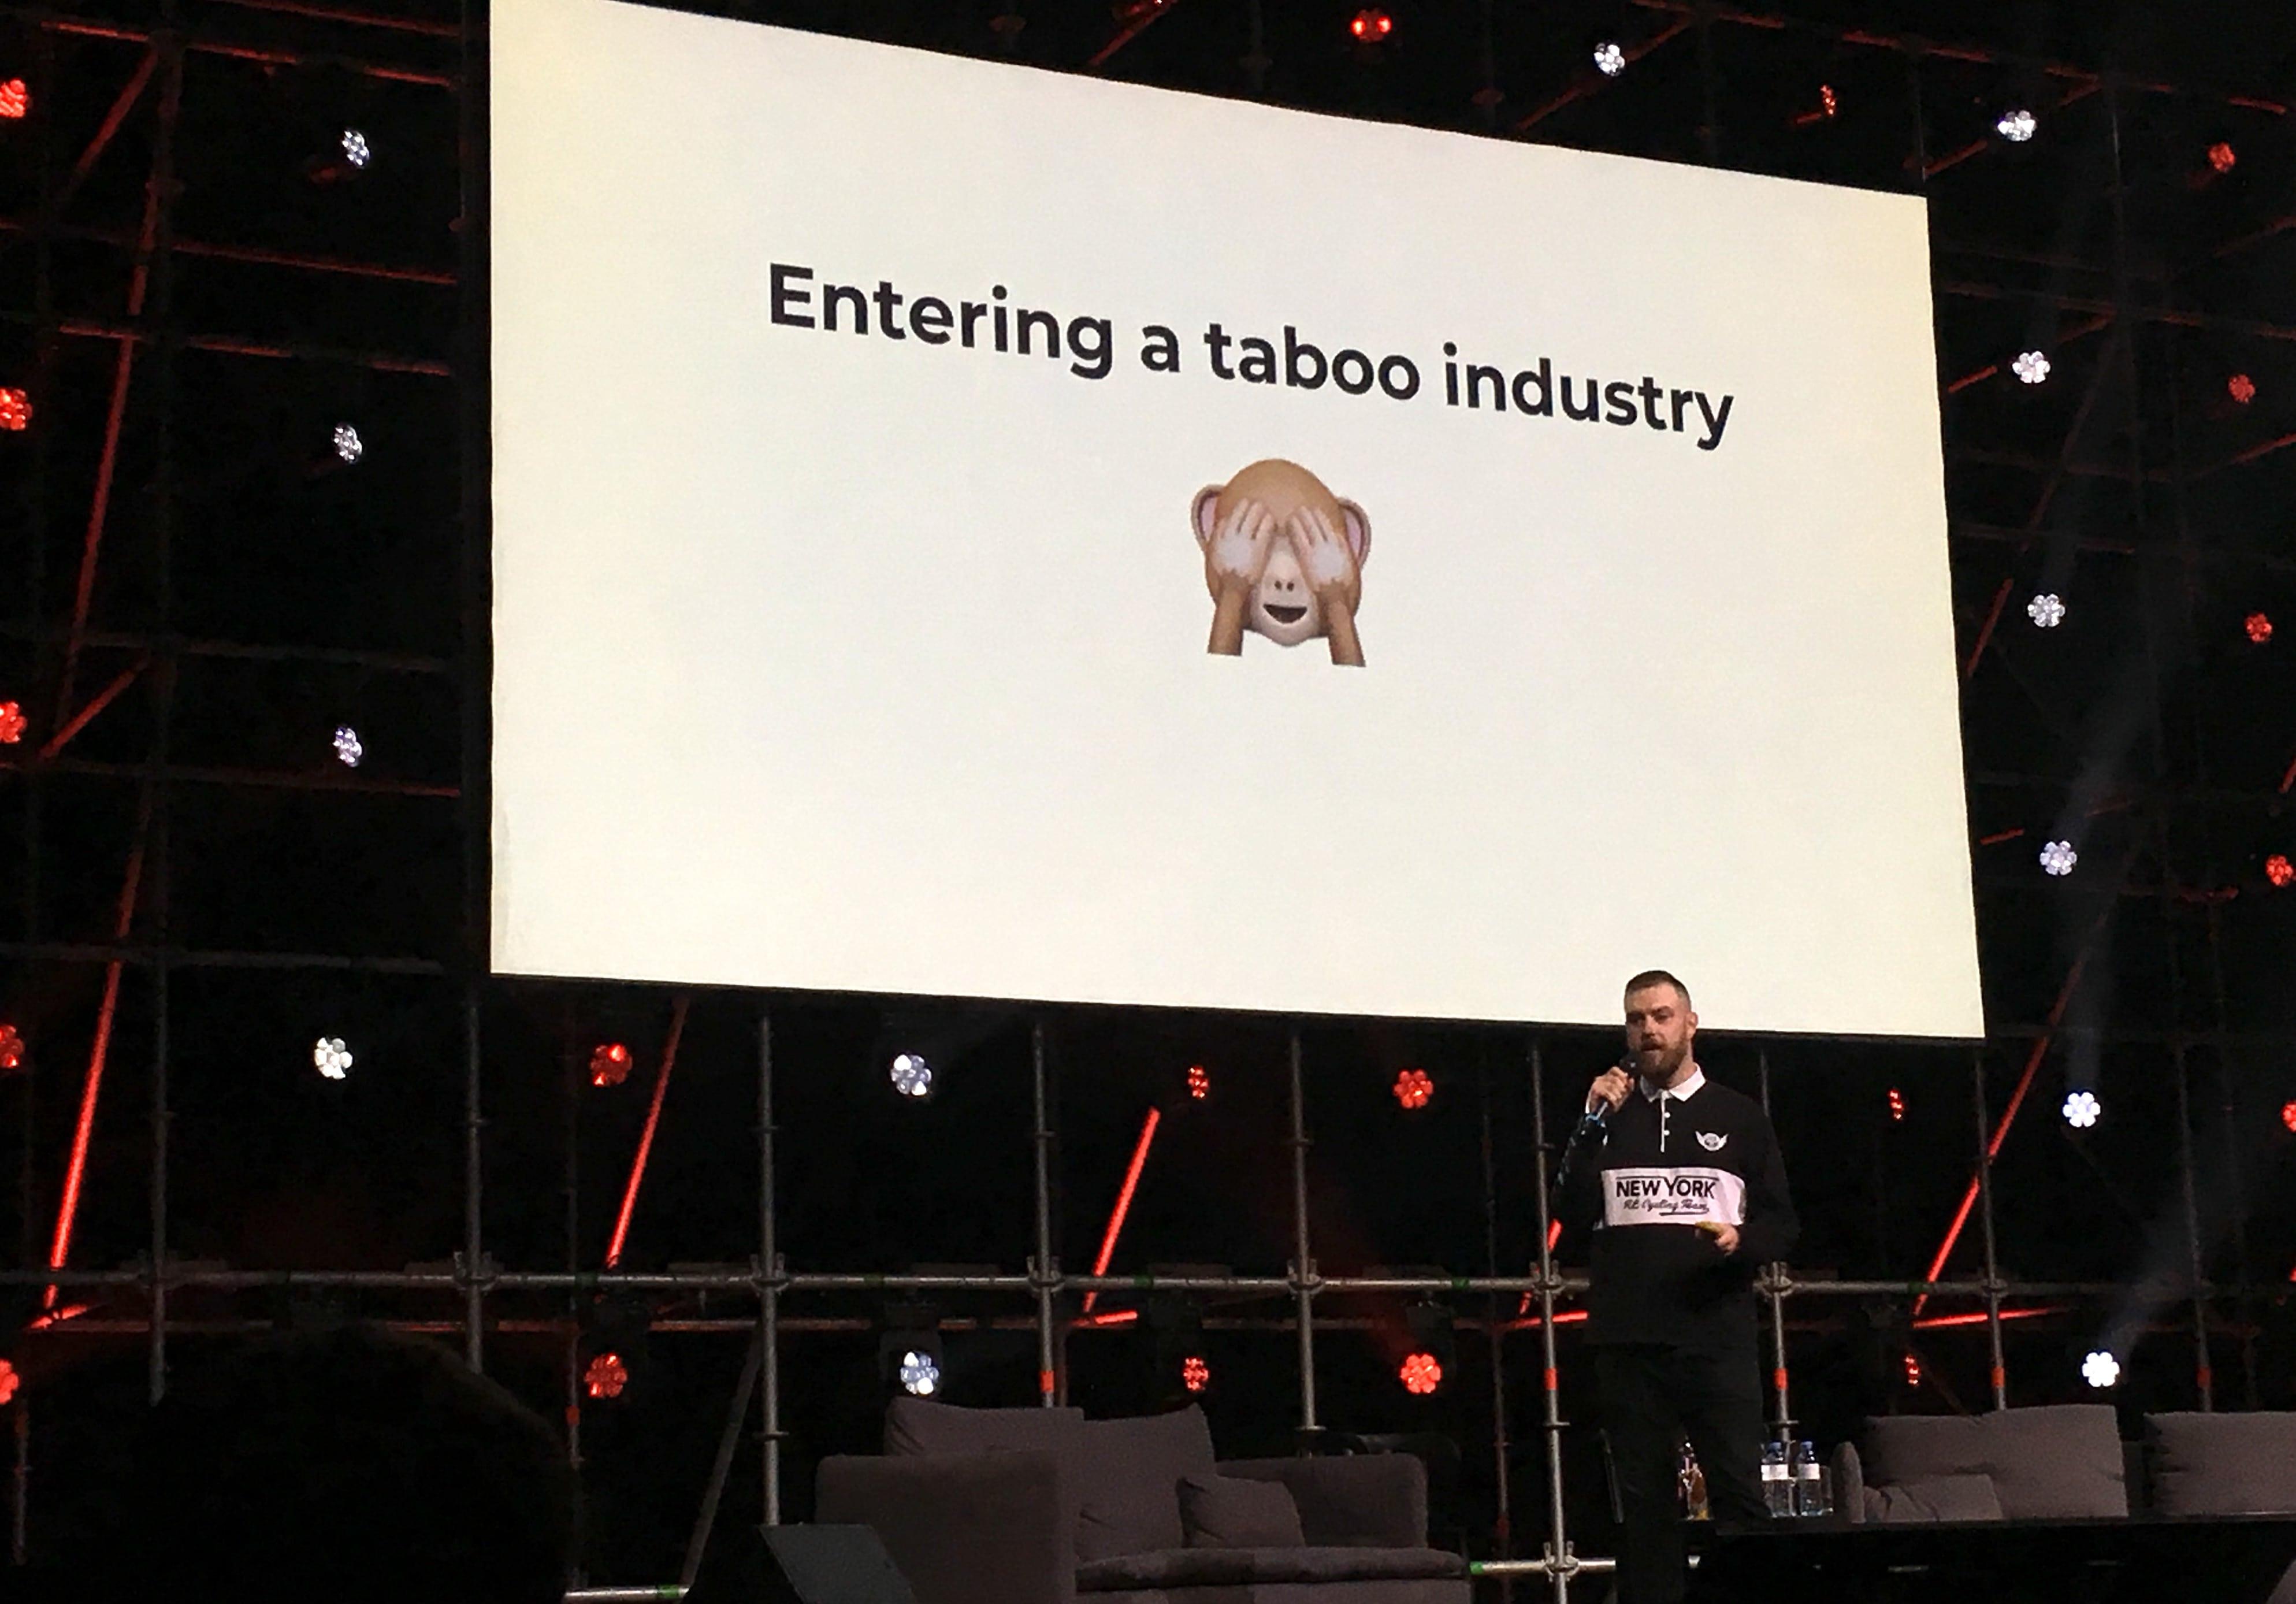 Andrew Cross Pornhub taboo industry